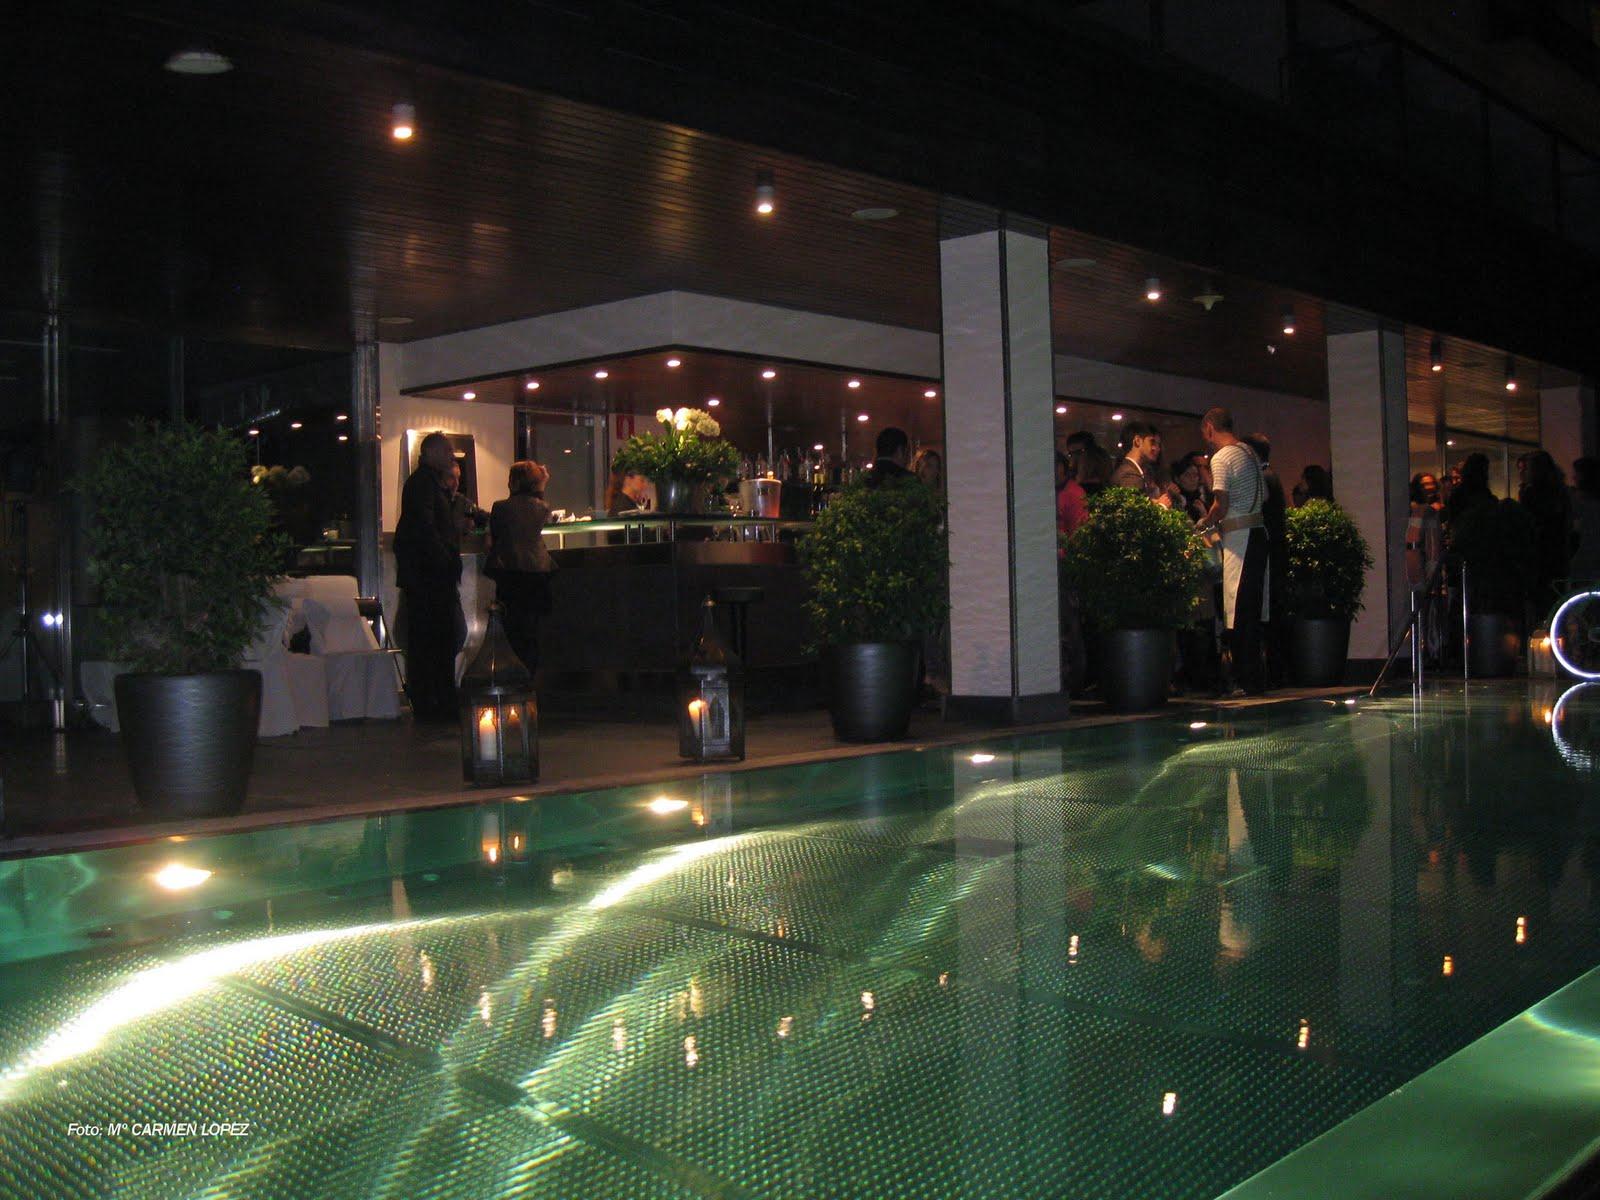 Blog de tejidos guillermina baeza chercher la femme for Hotel chercher